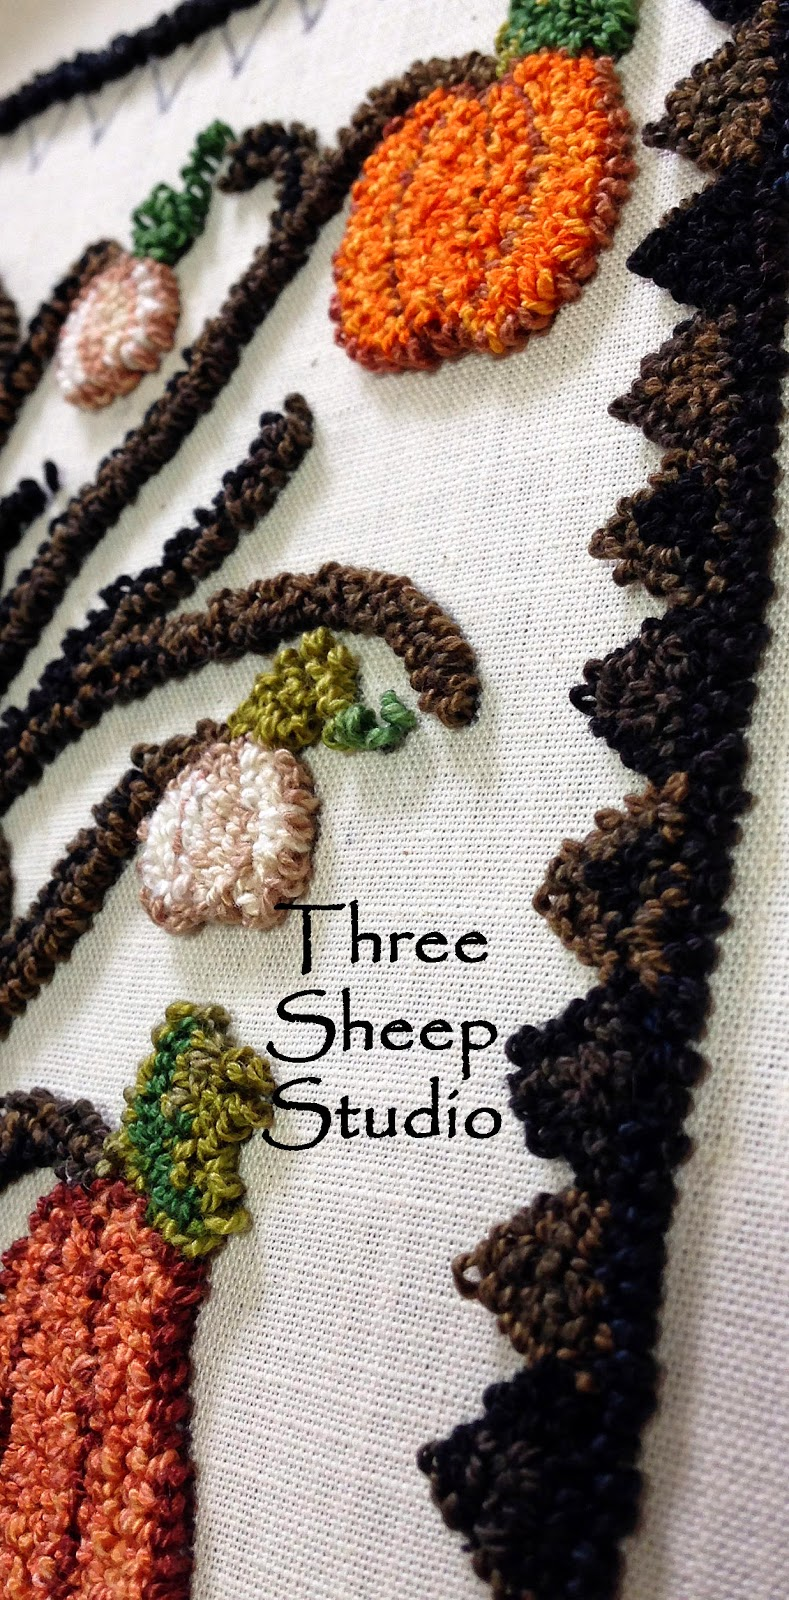 Three sheep - photo#32